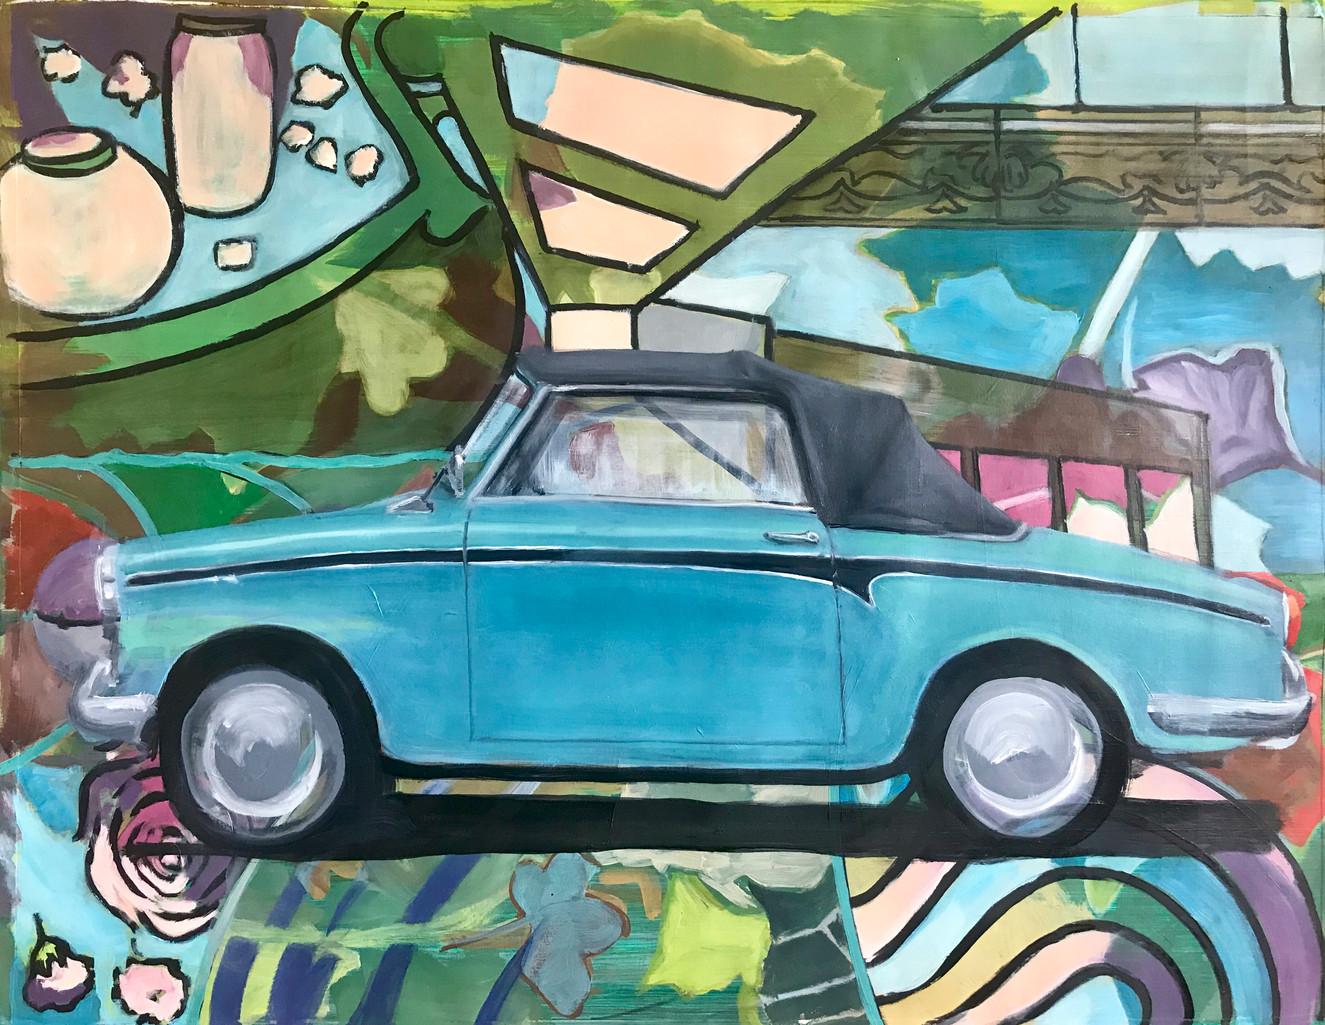 Ricky's car